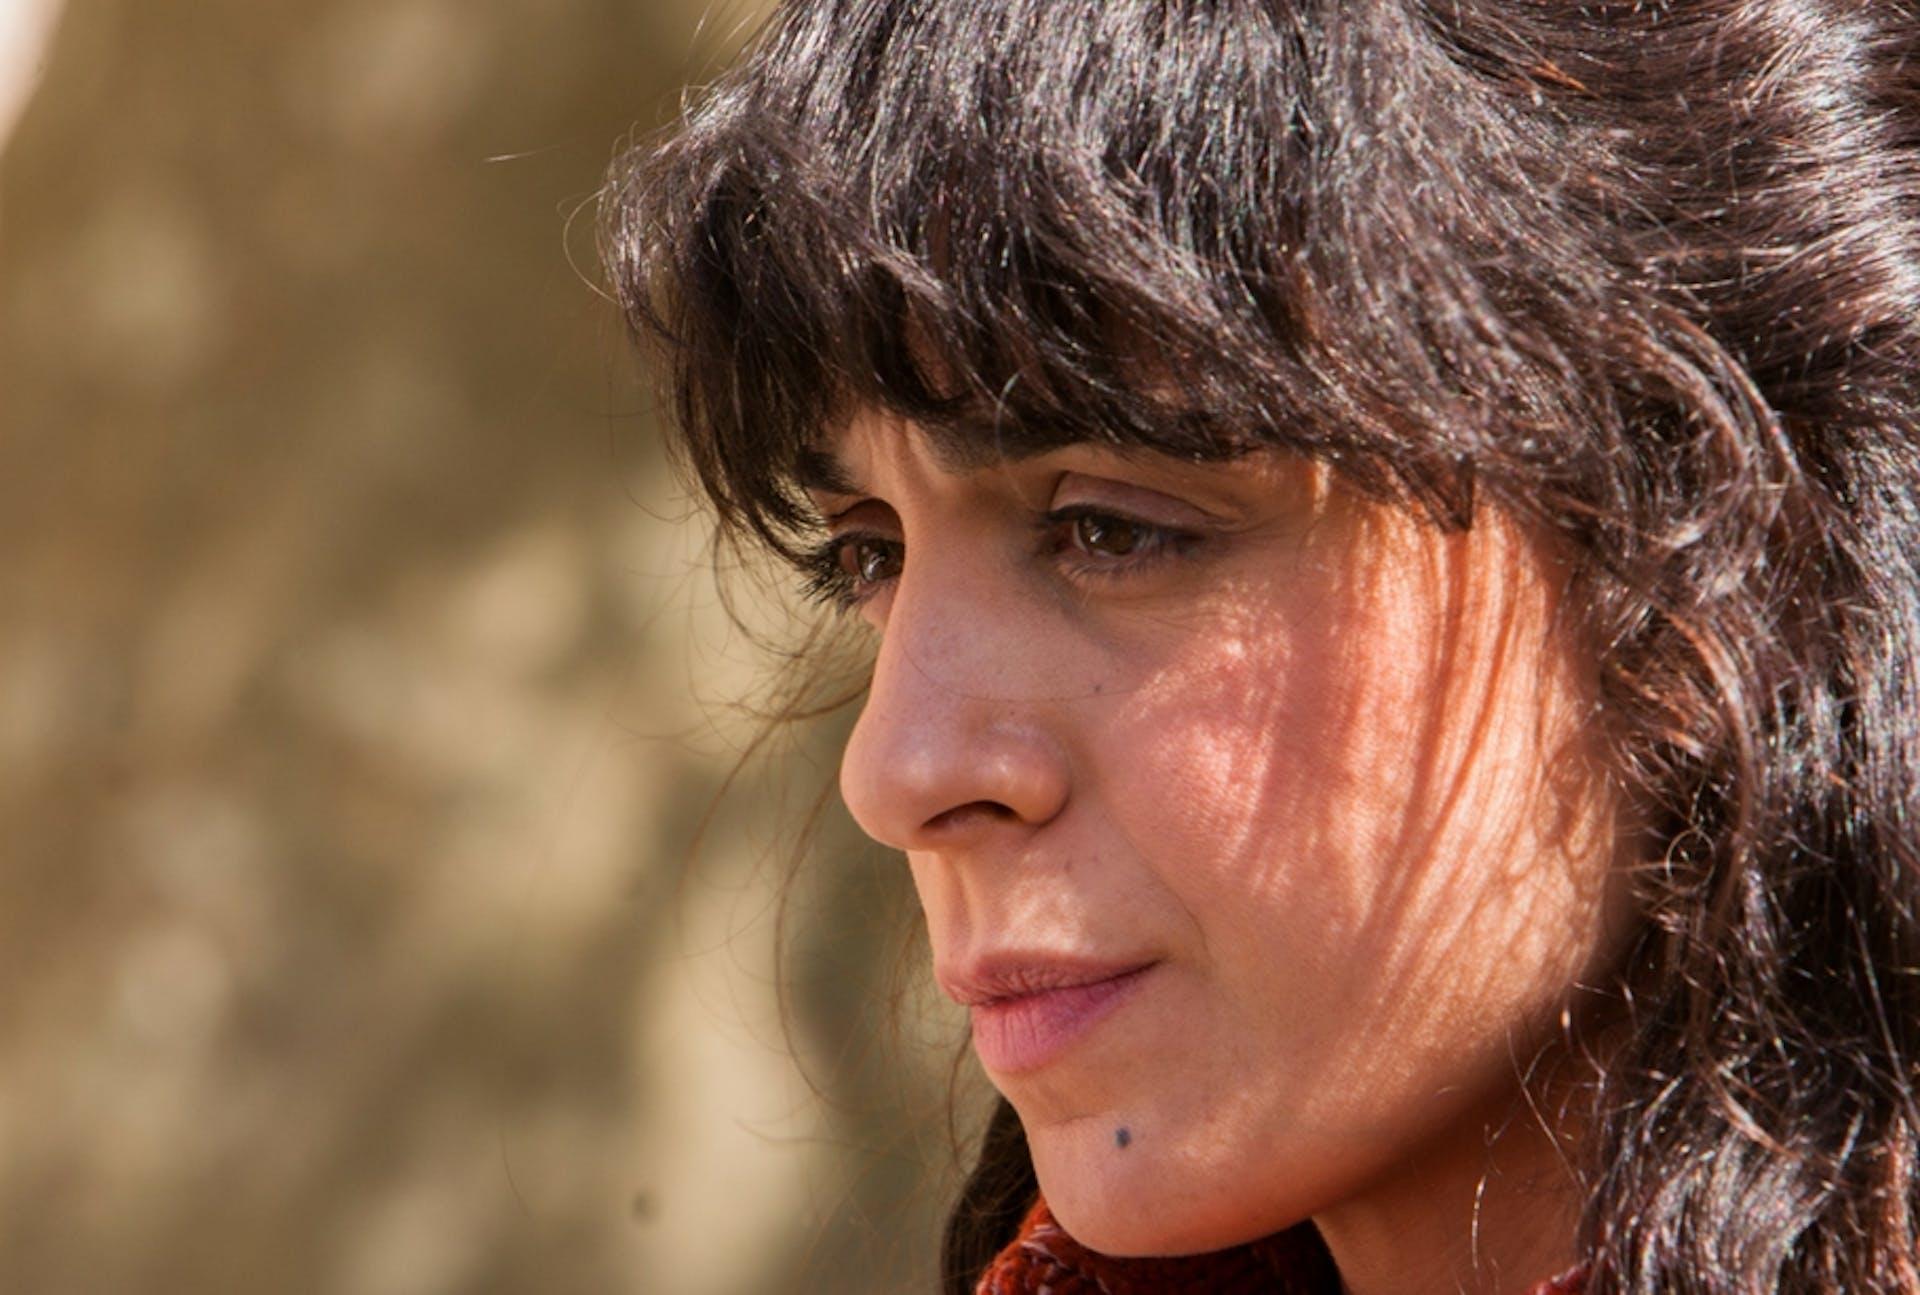 AKA Nadia (Nadia — Shem Zemani)